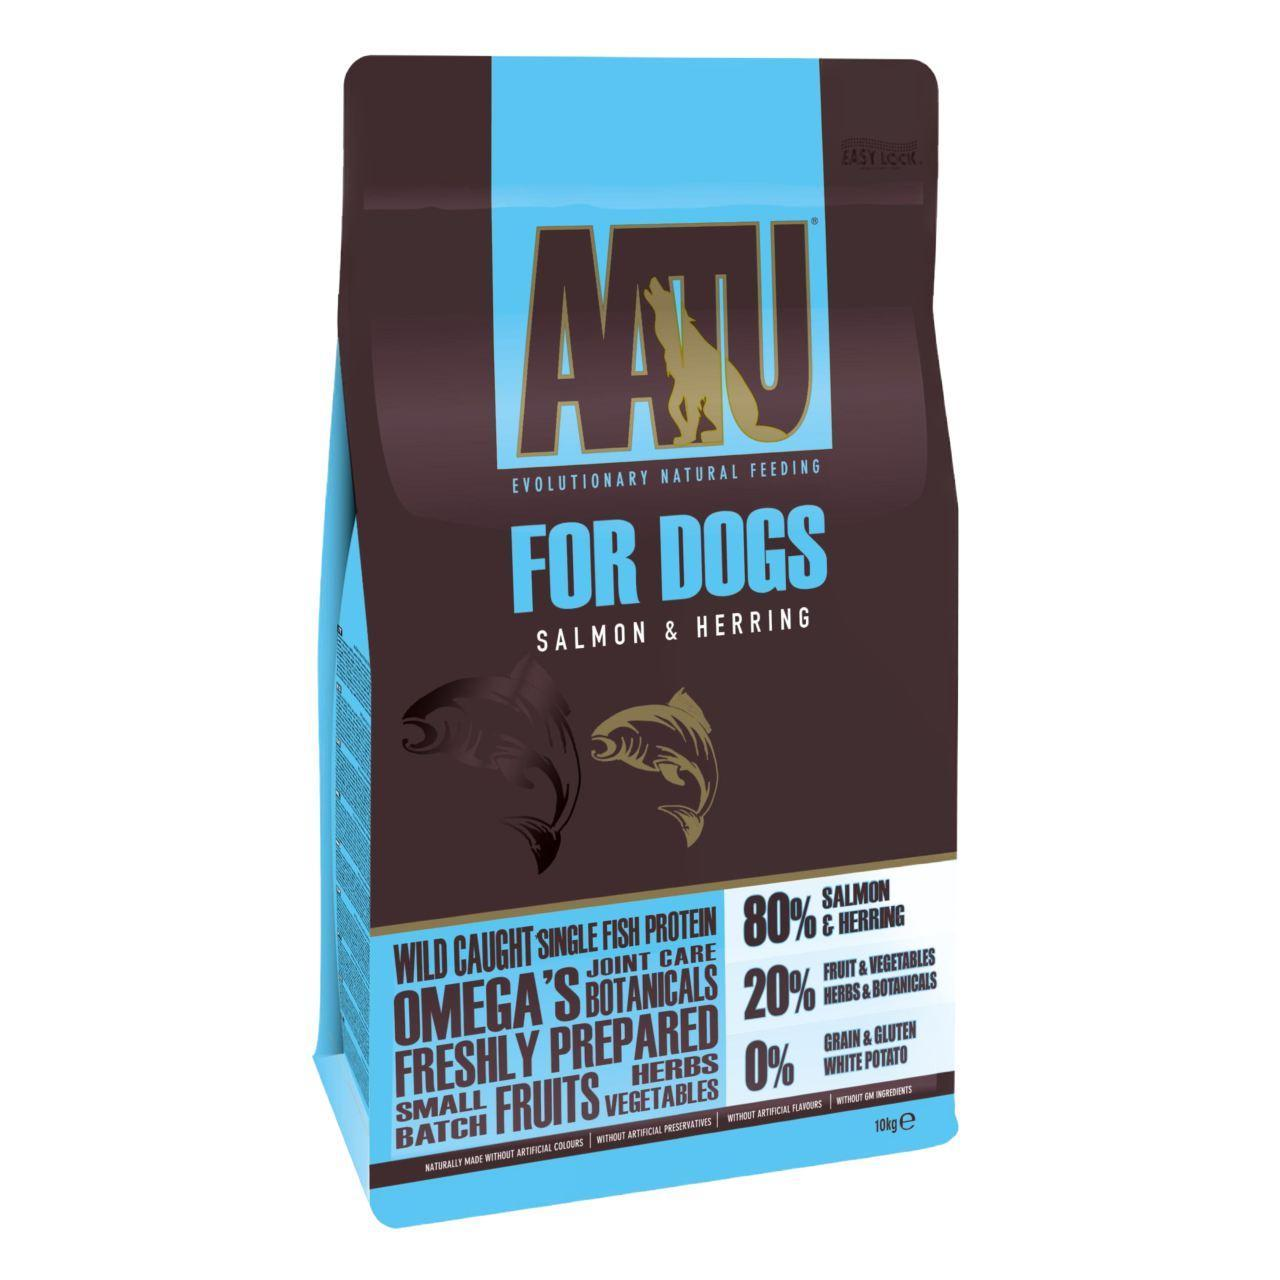 An image of AATU 80/20 Salmon Complete Grain Free Dry Dog Food